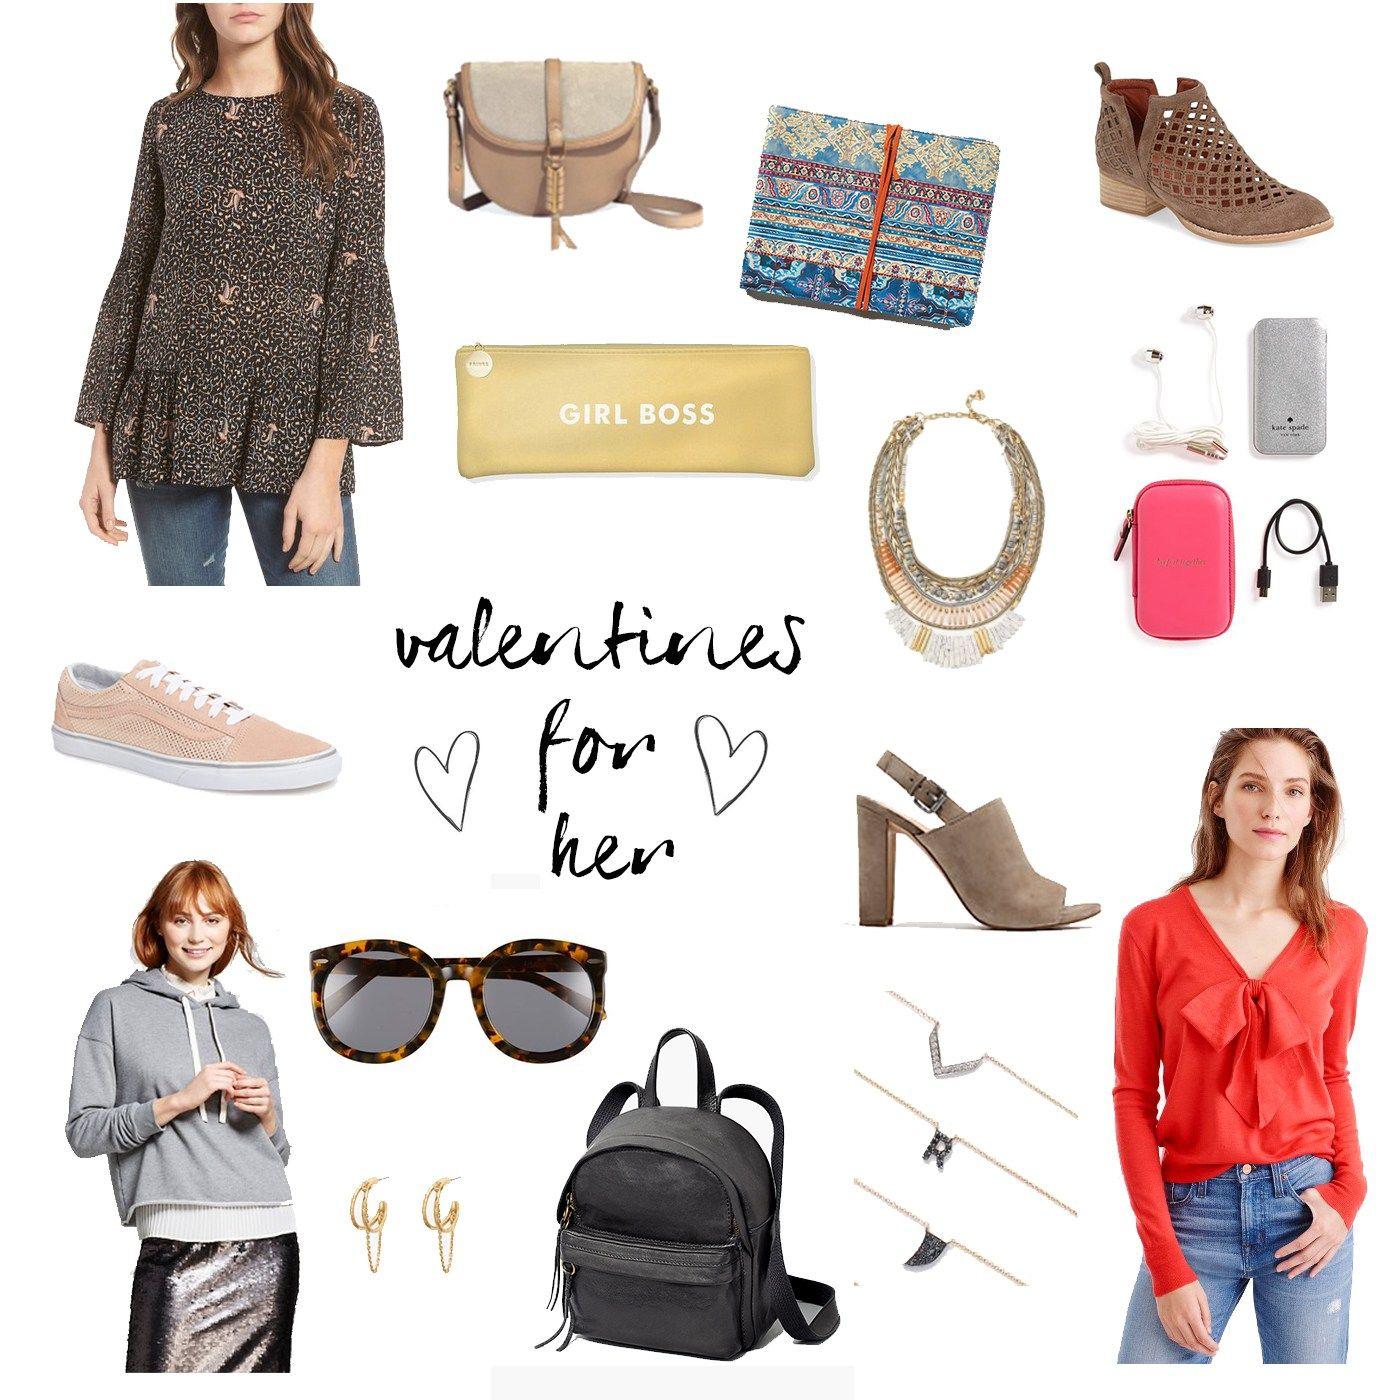 Valentine's Day Gift Guide for Her. www.jillianrosado.com IG @ jillianrosado